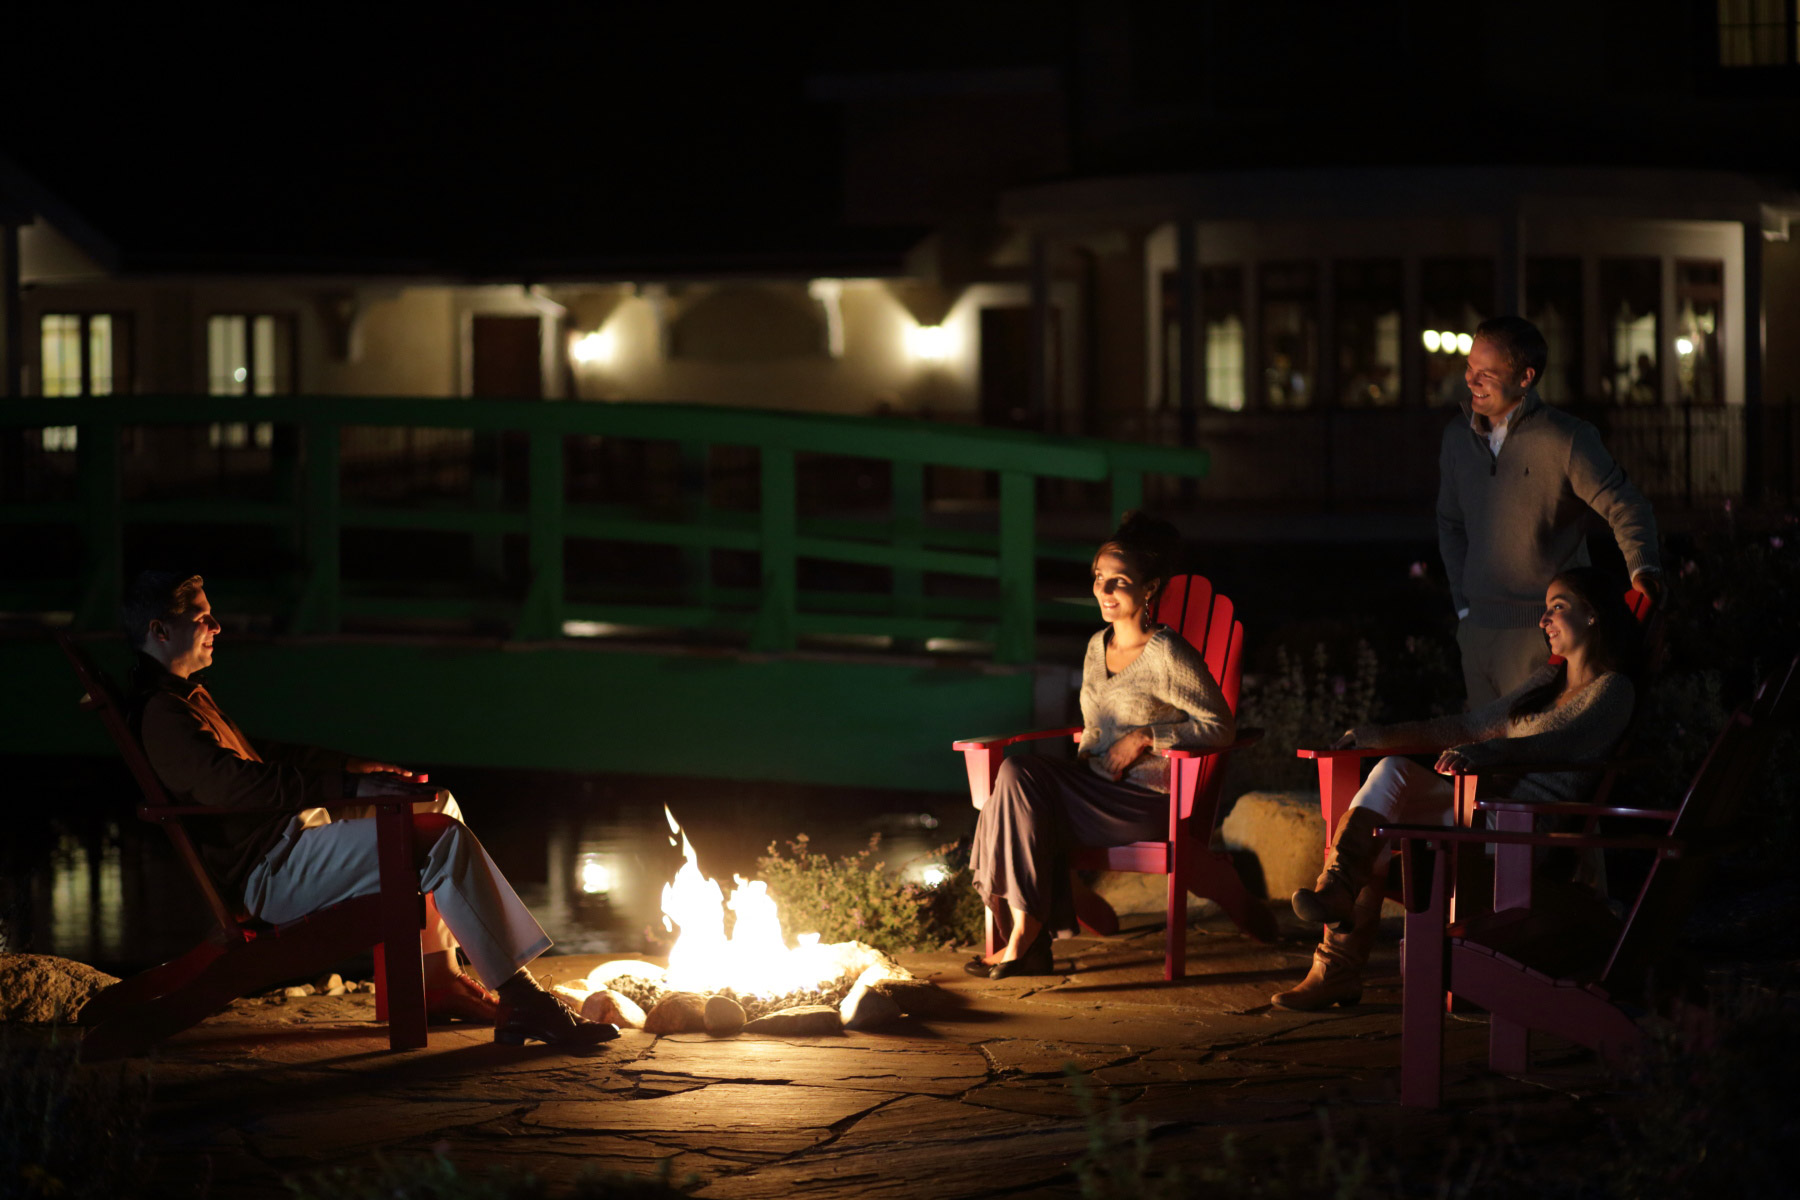 Making memories around the fire